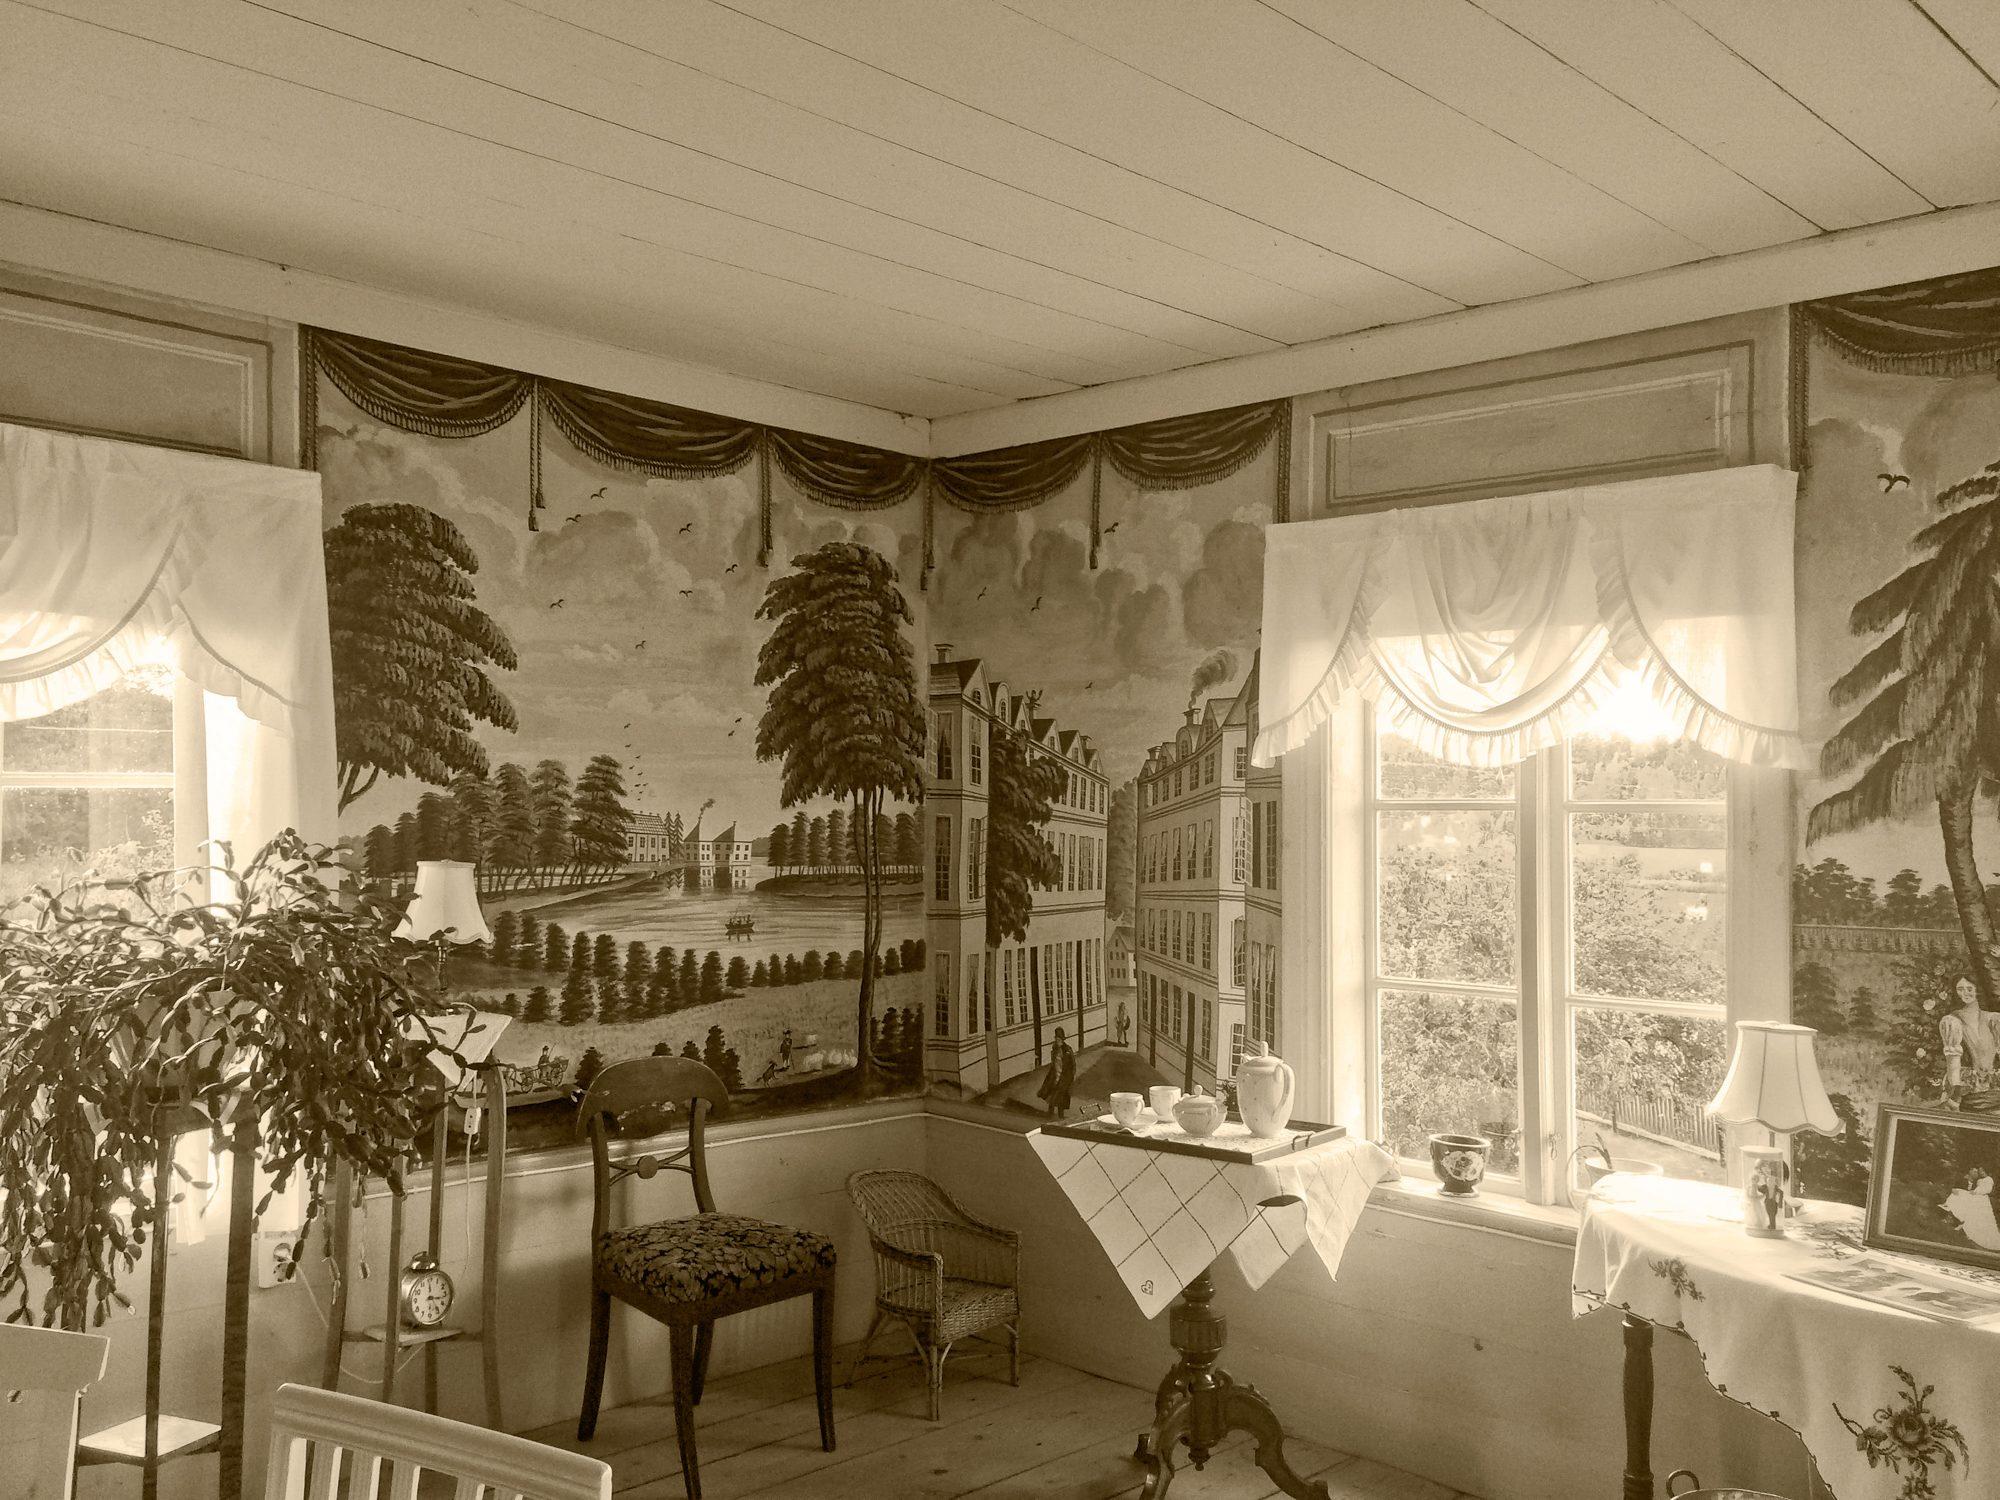 Sundbybergs fotoklubb